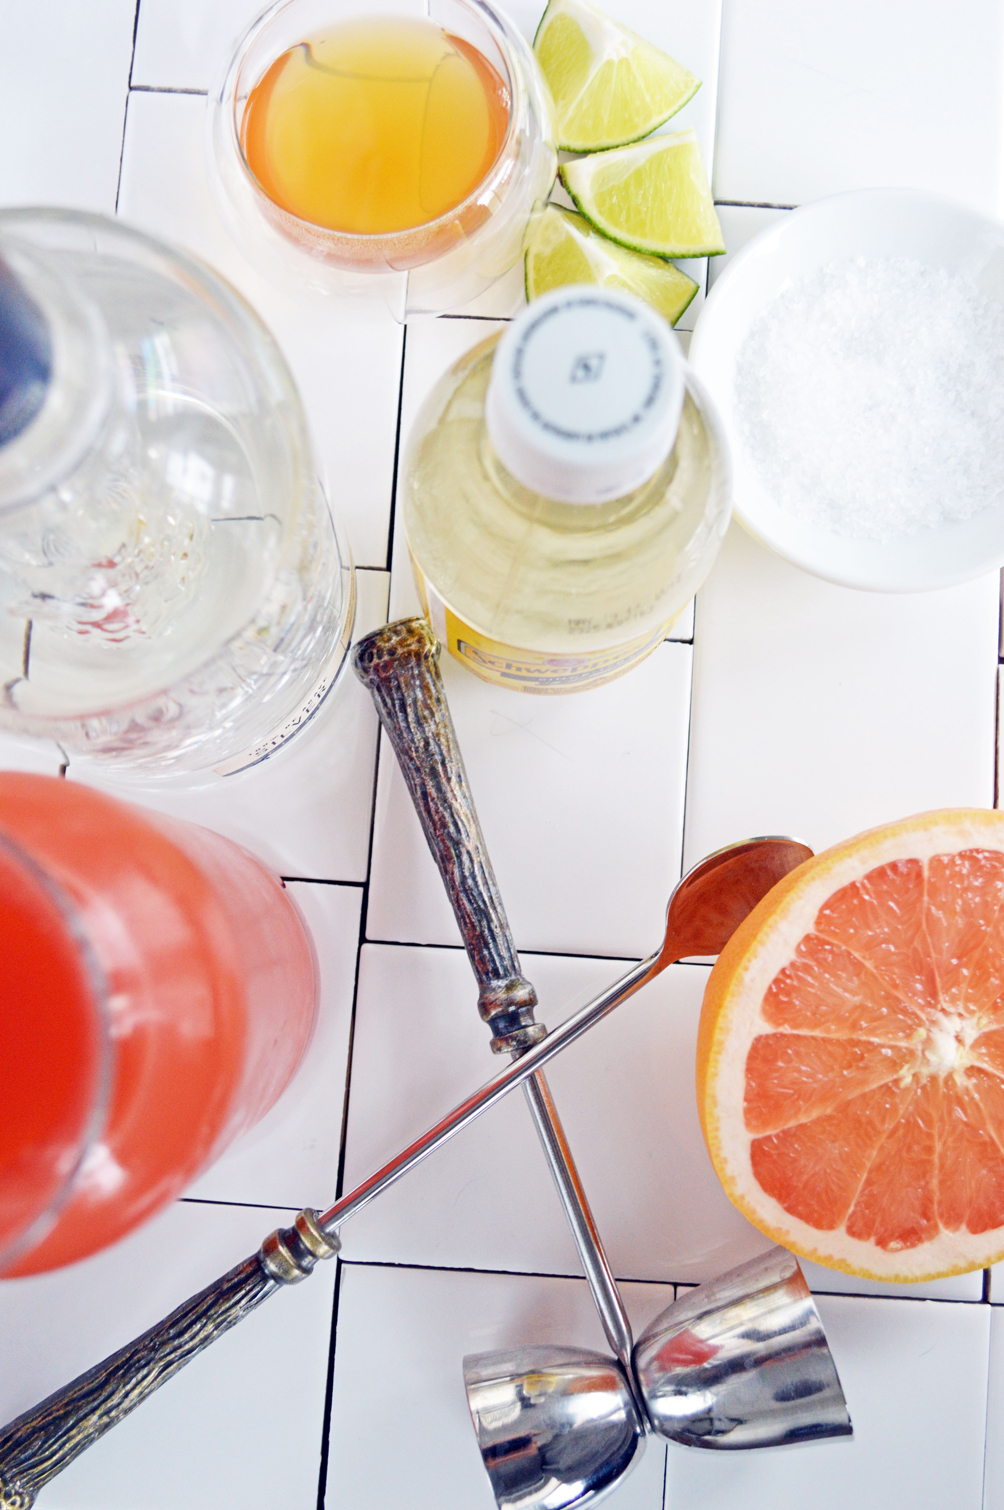 refreshing grapefruit lime cocktail